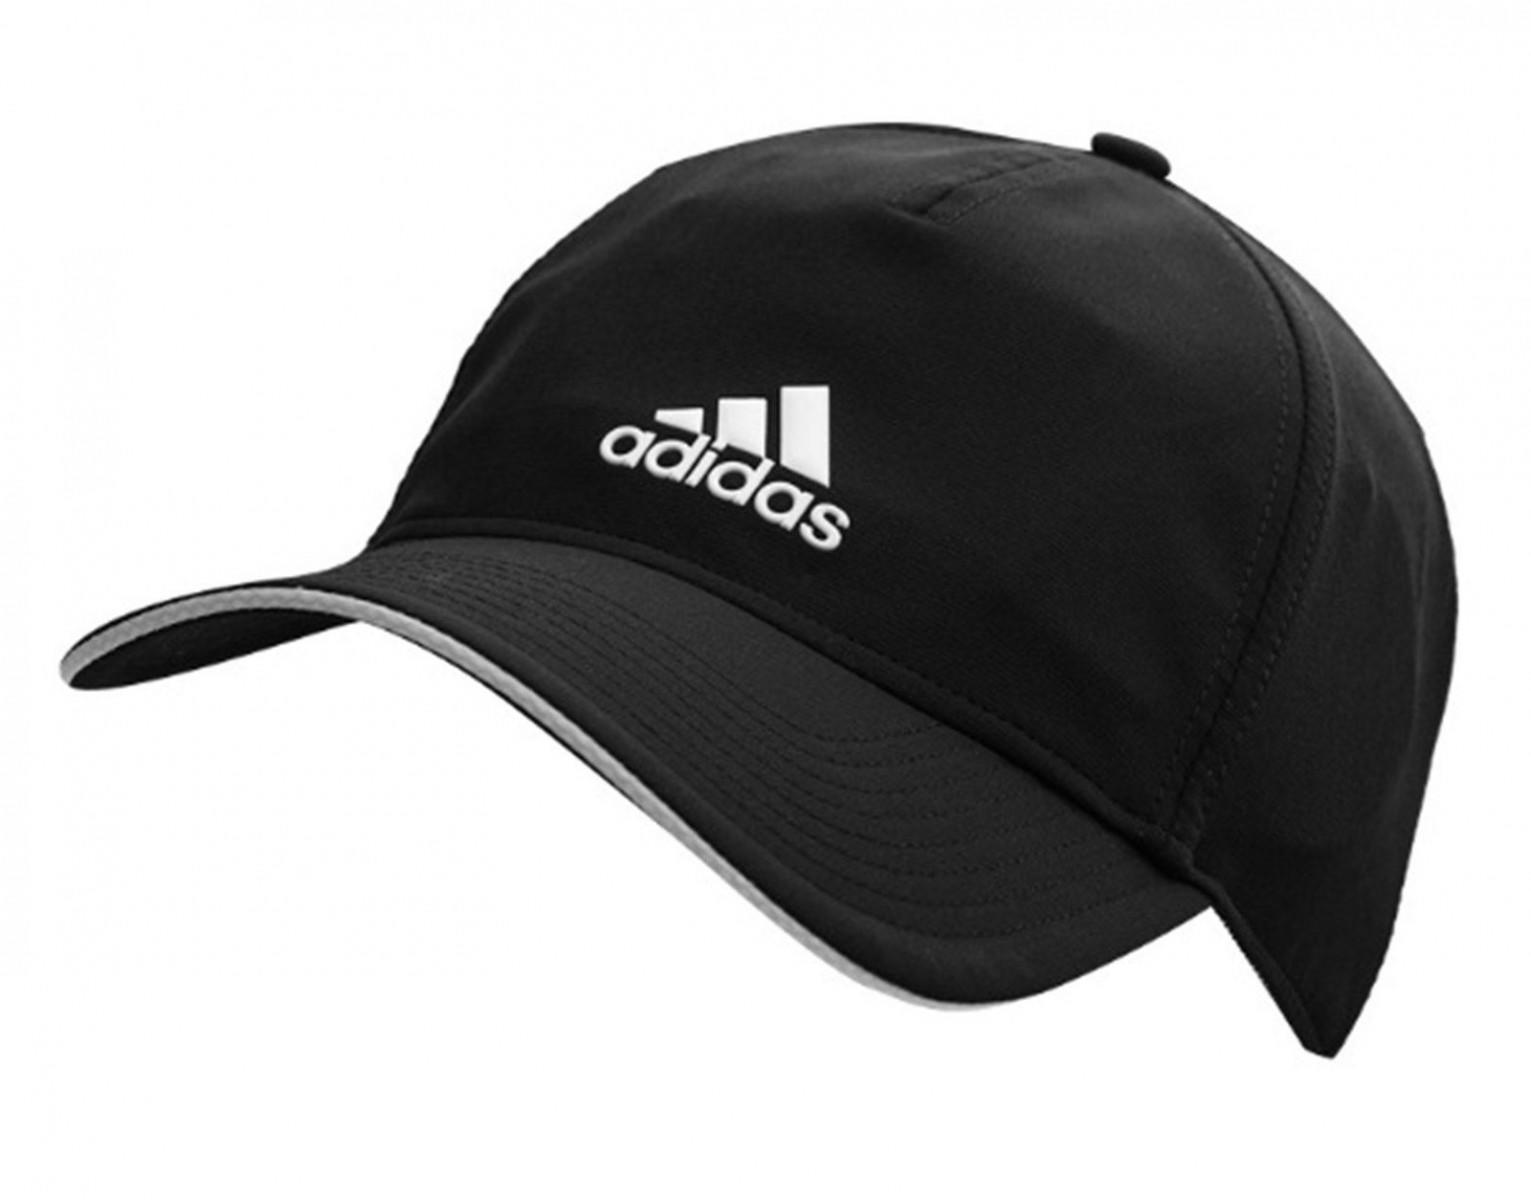 Теннисная кепка Adidas Climalite C40 5P Climalite Cap black/white